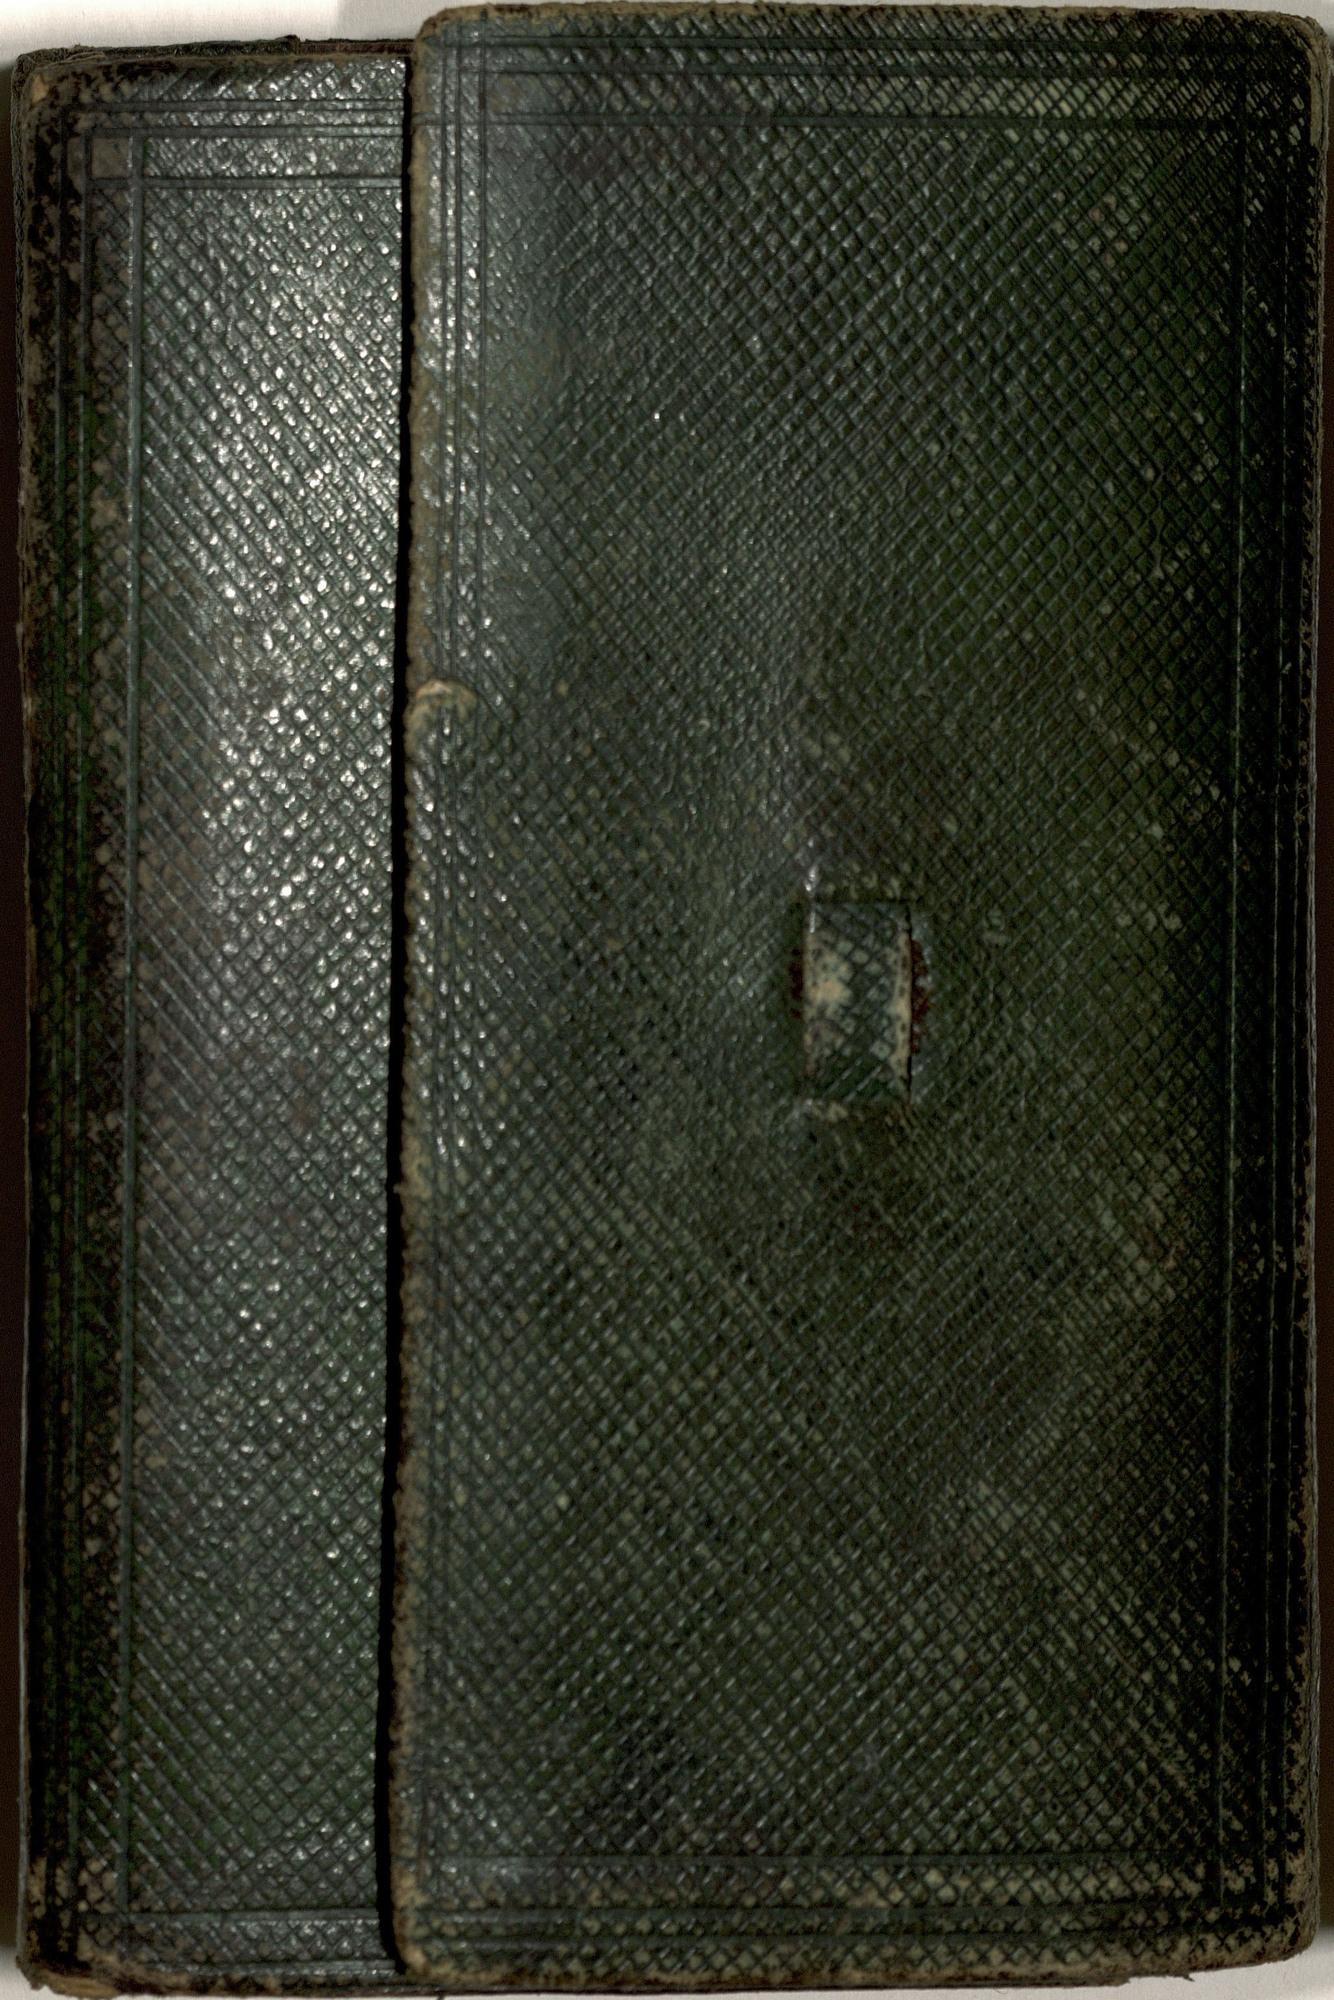 Ms2010-061_WarnerMarcus_Diary_1864_frontcover.jpg